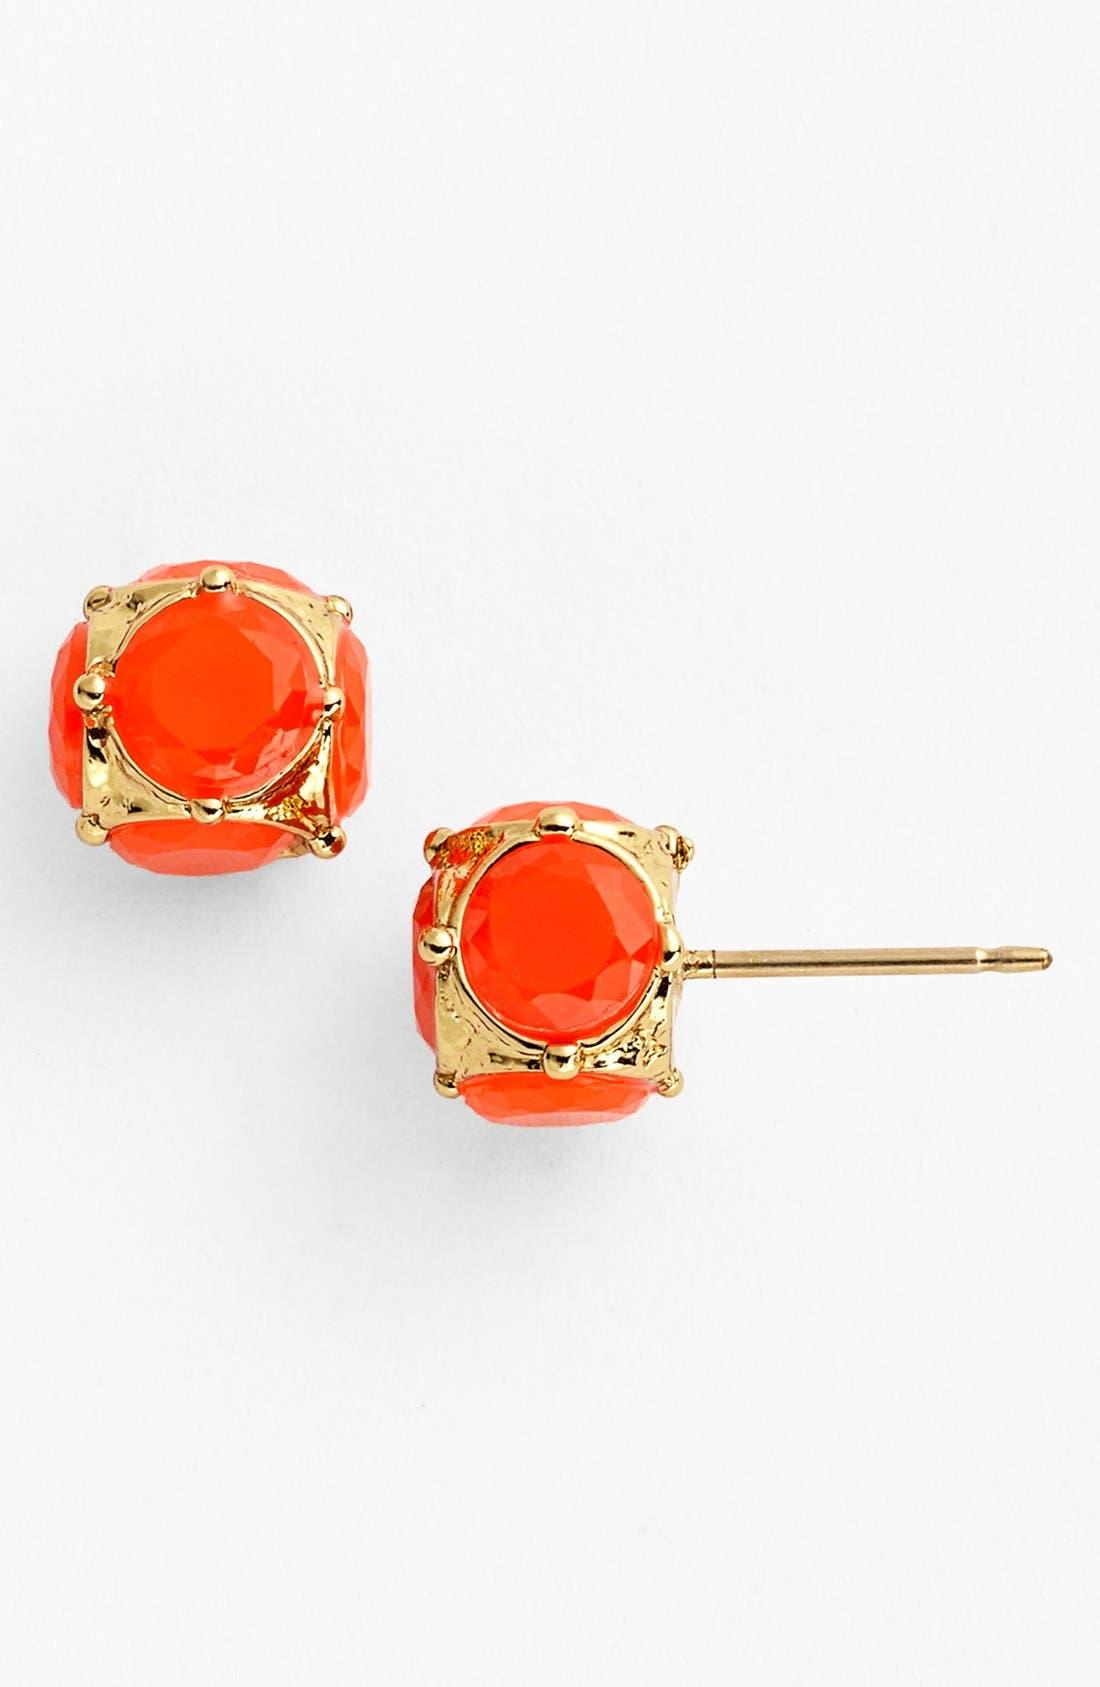 Main Image - kate spade new york small ball stud earrings